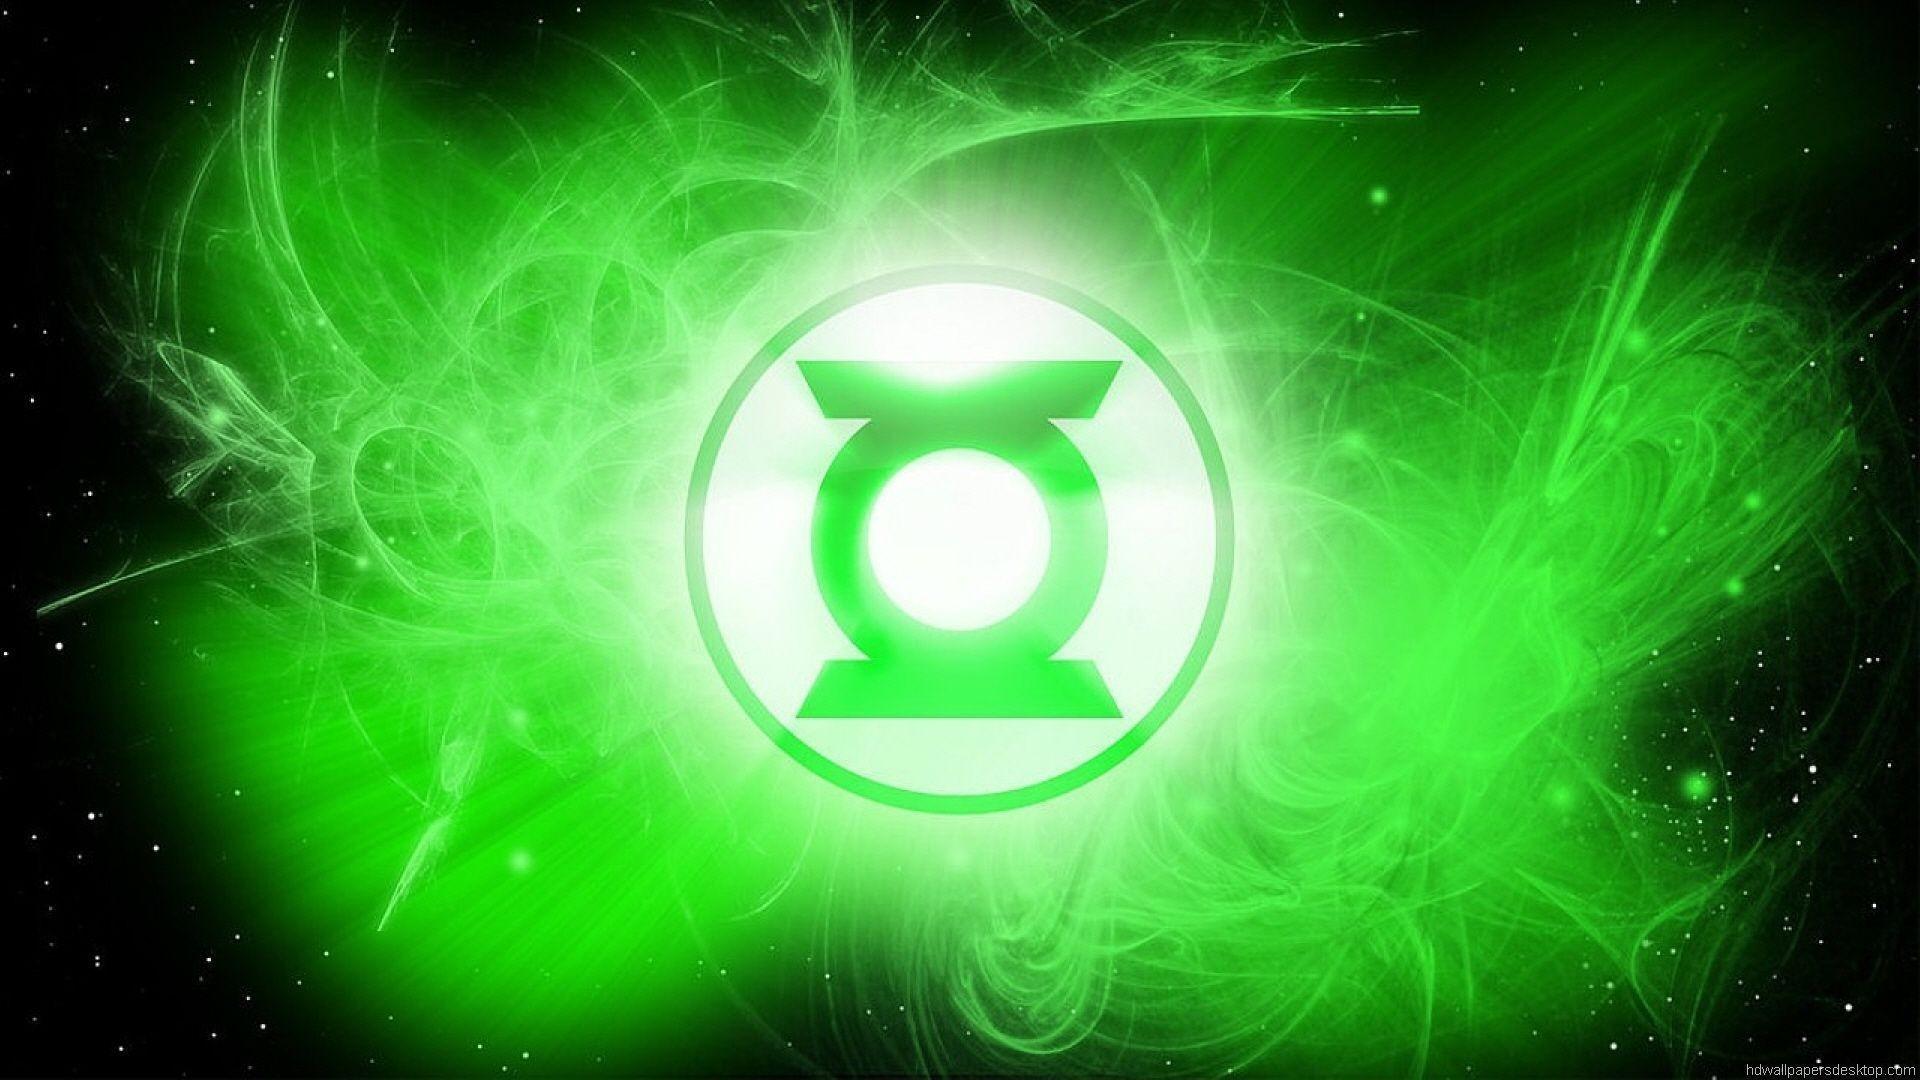 Cool Green Lantern wallpaper